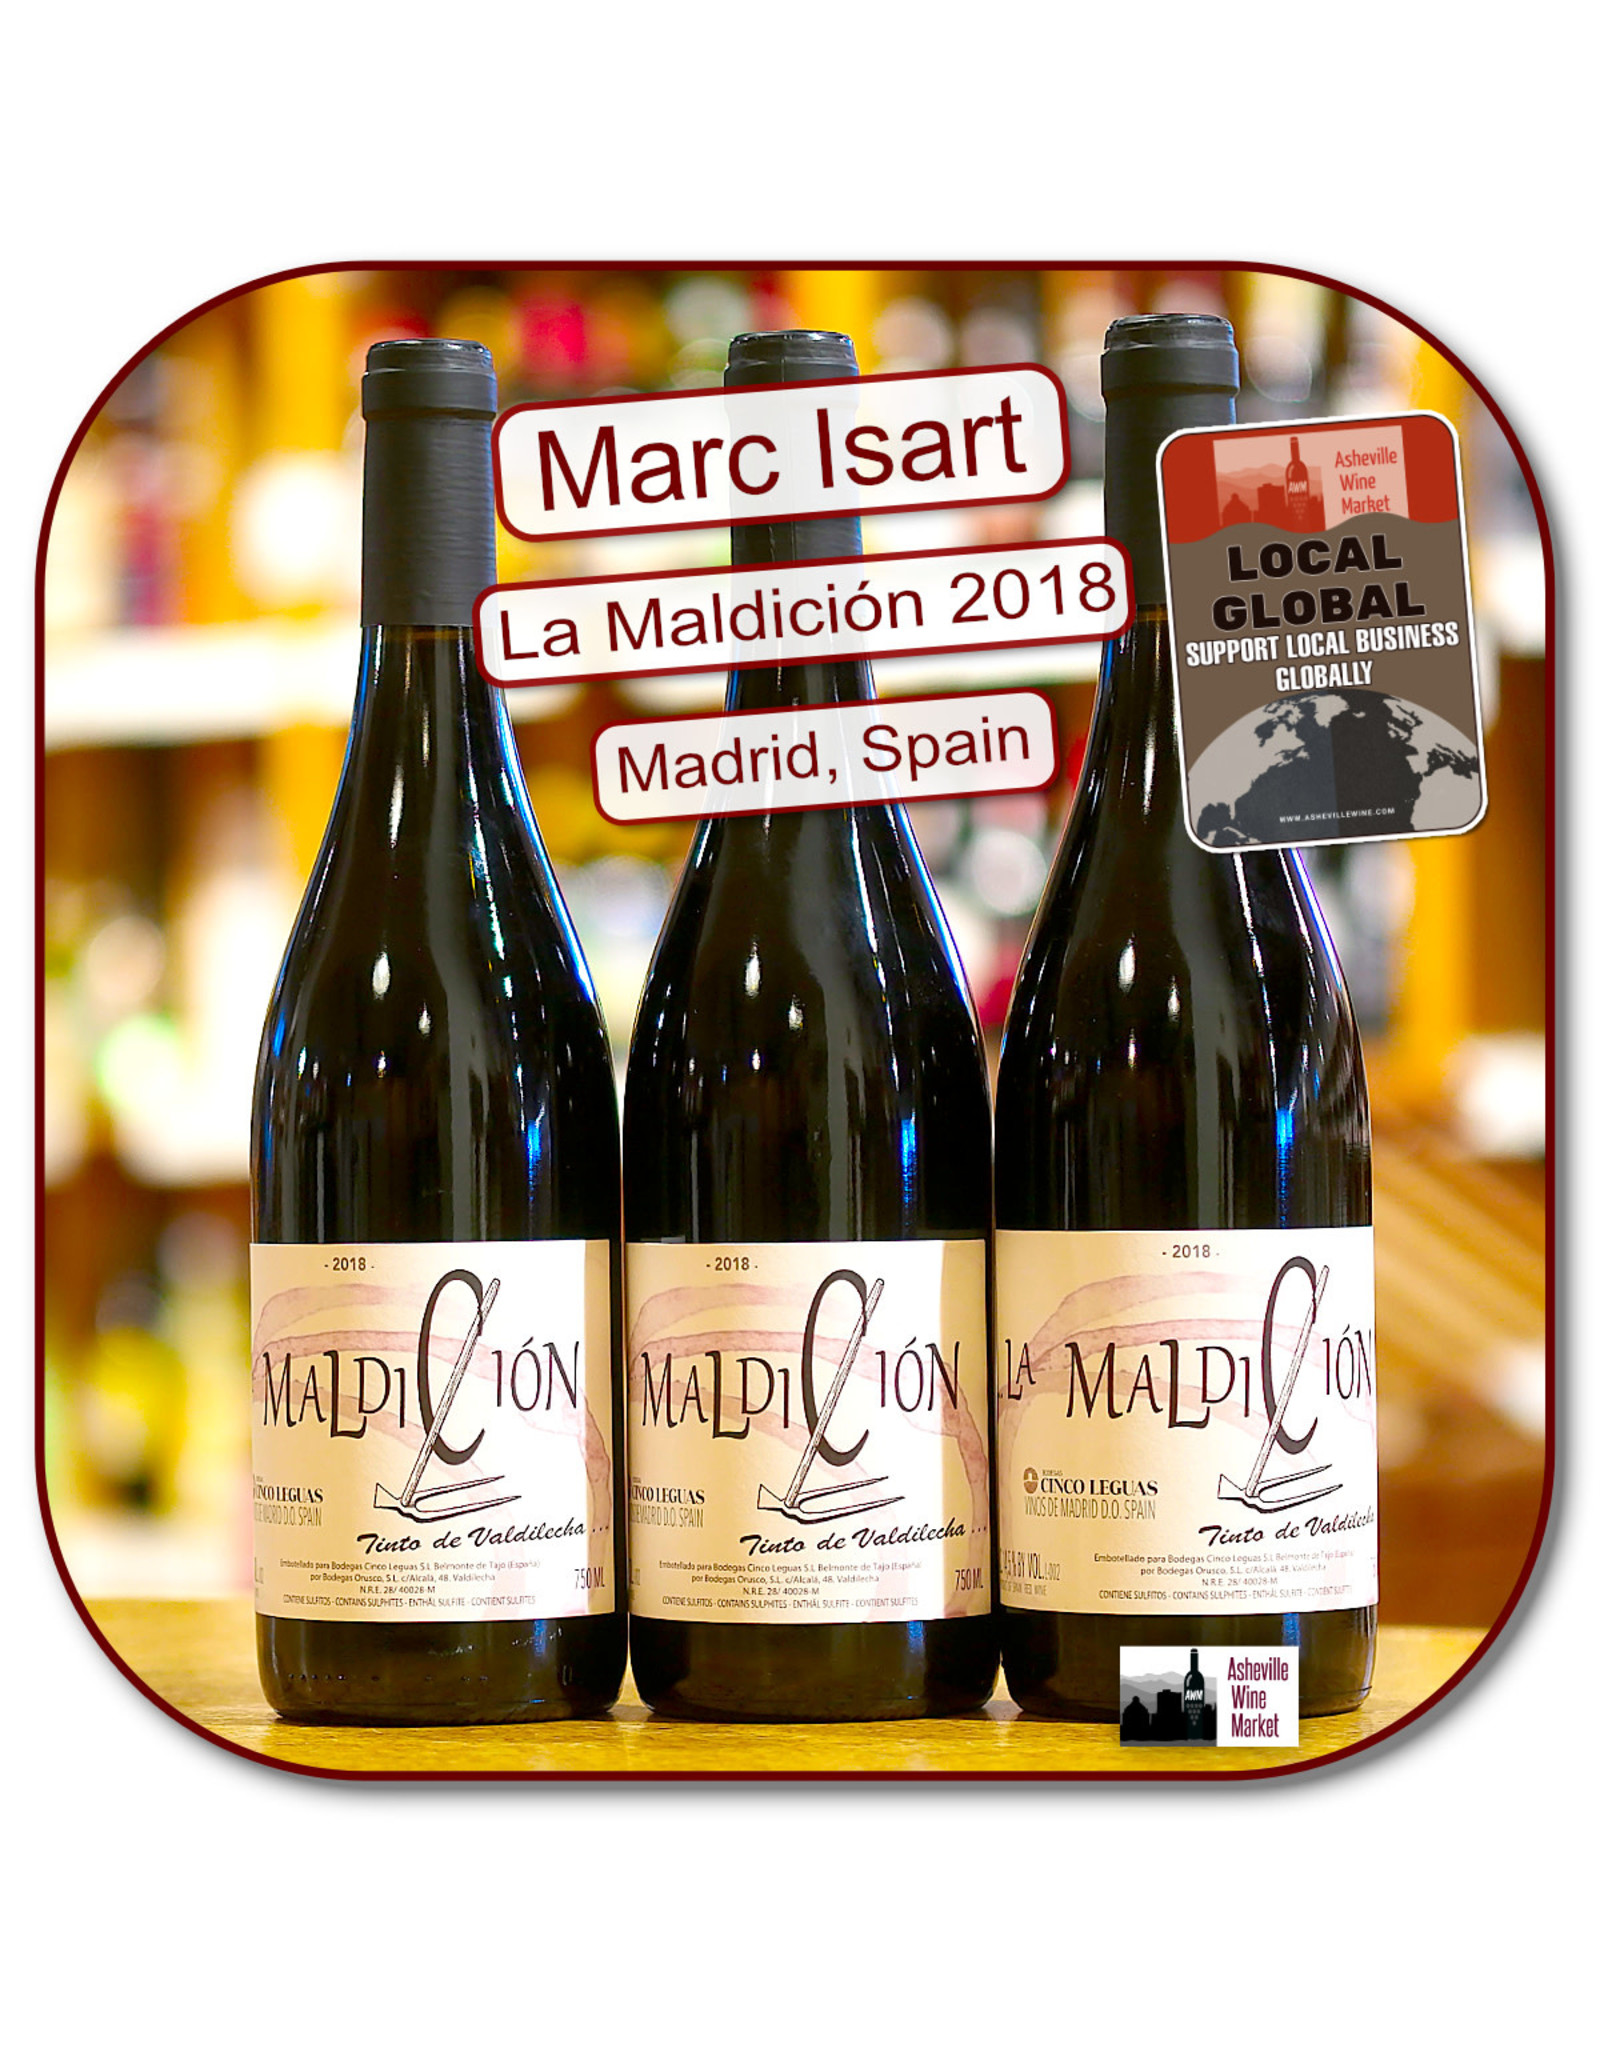 Red Blend - Europe Marc Isart Maldicion 18